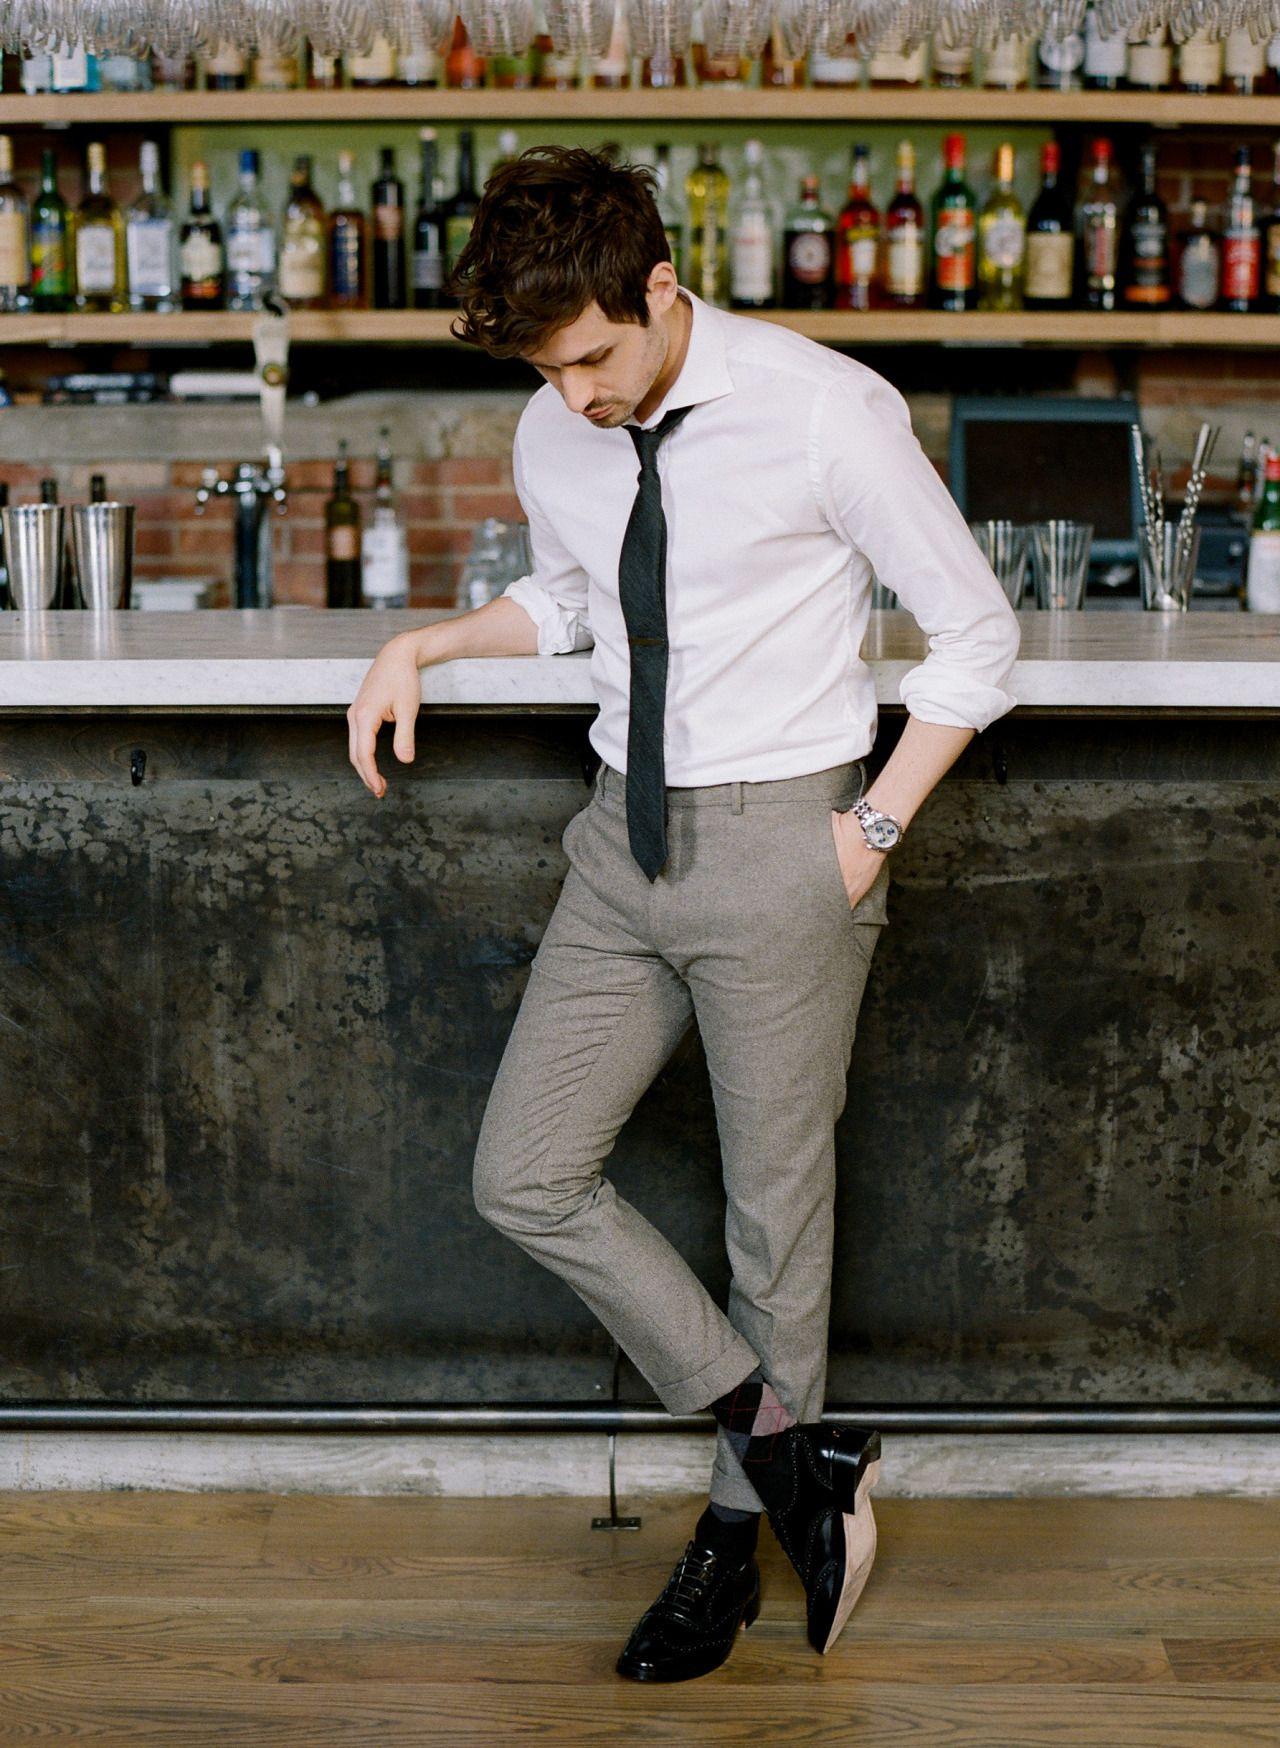 Men S White Dress Shirt Grey Wool Dress Pants Black Leather Brogues Black Tie Formal Mens Fashion Mens Outfits Mens Fashion Classy [ 1748 x 1280 Pixel ]